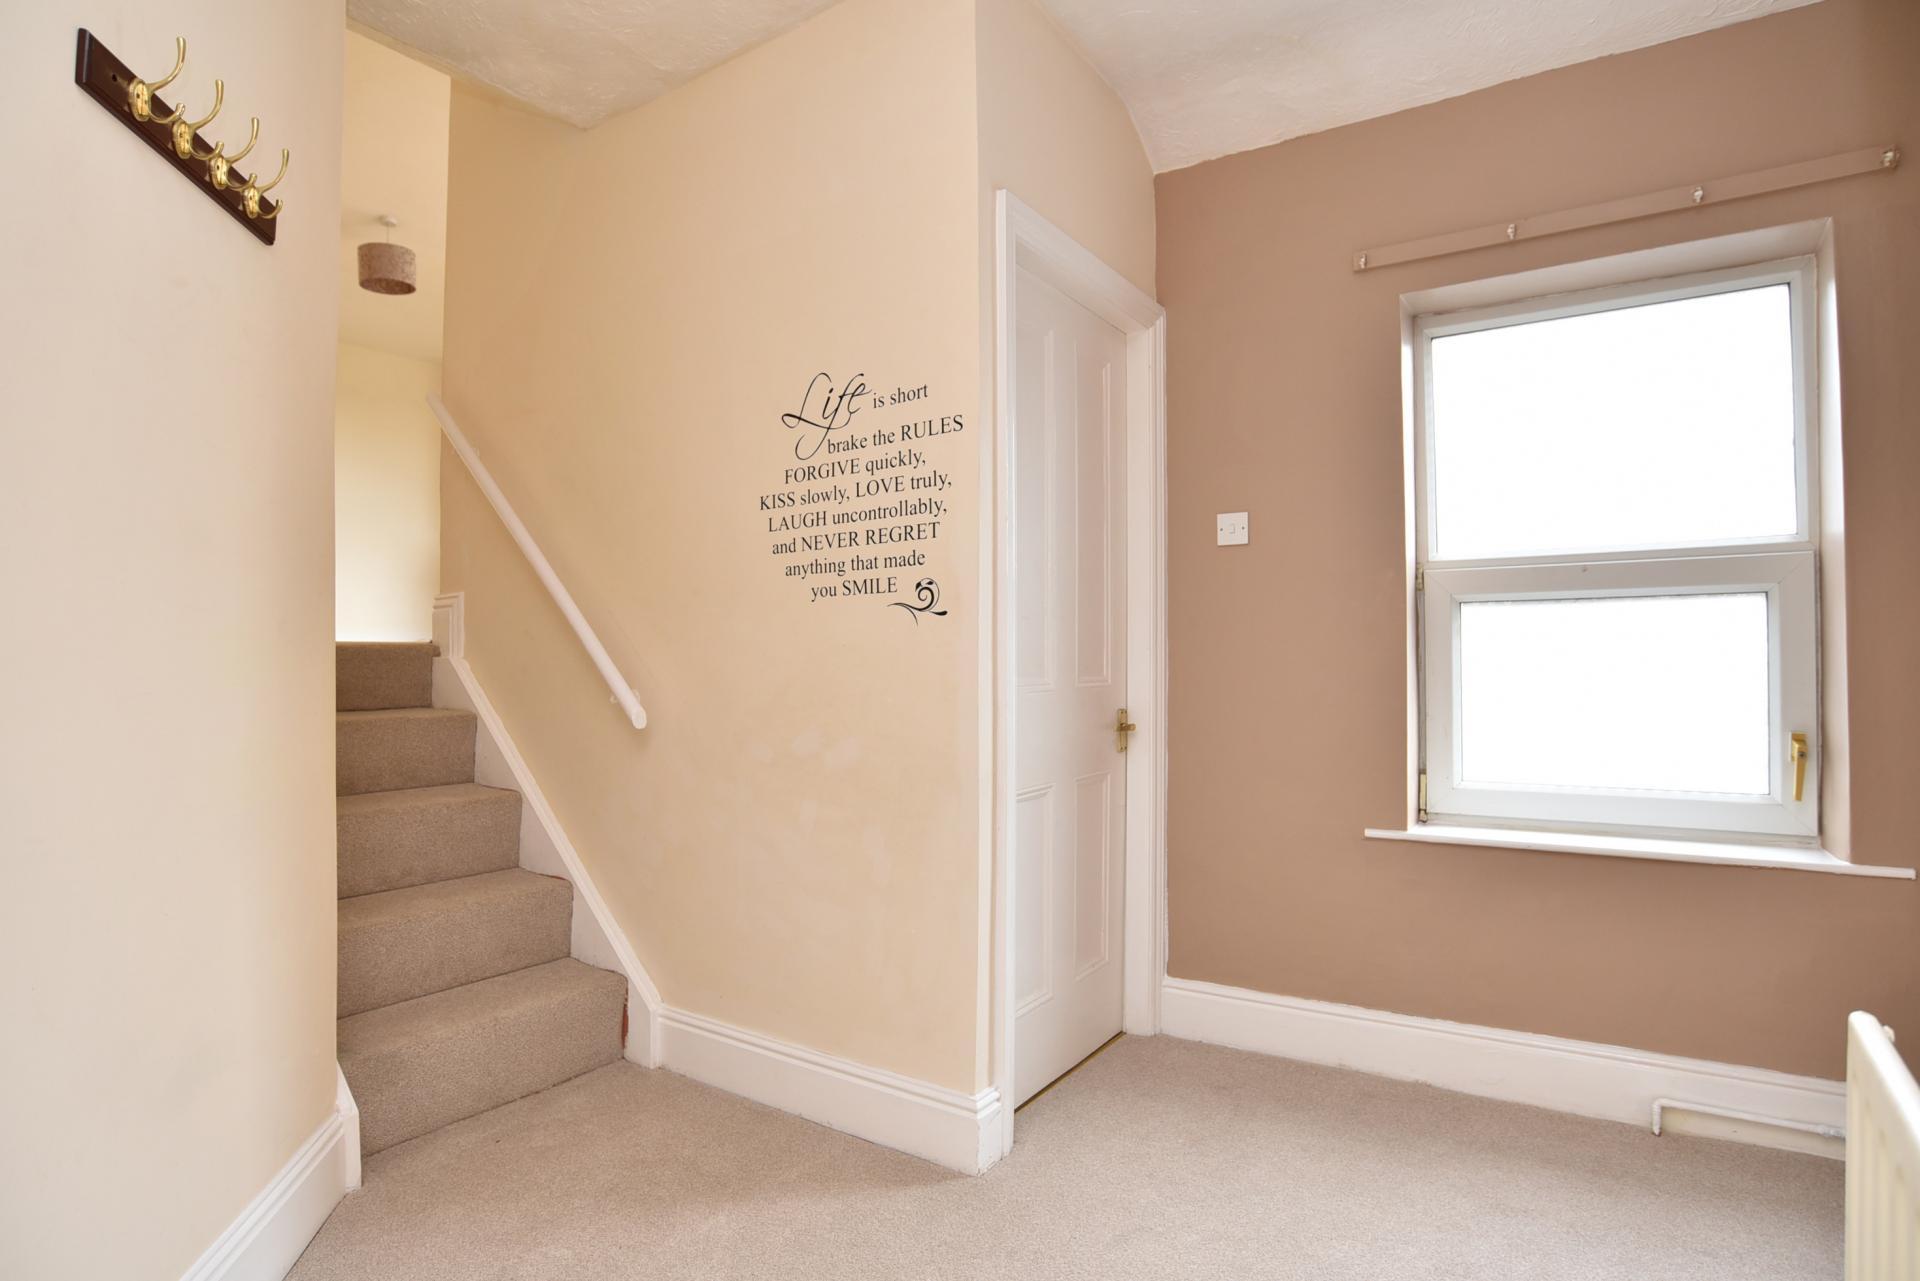 Properties For Sale Harrogate Hg Postcode